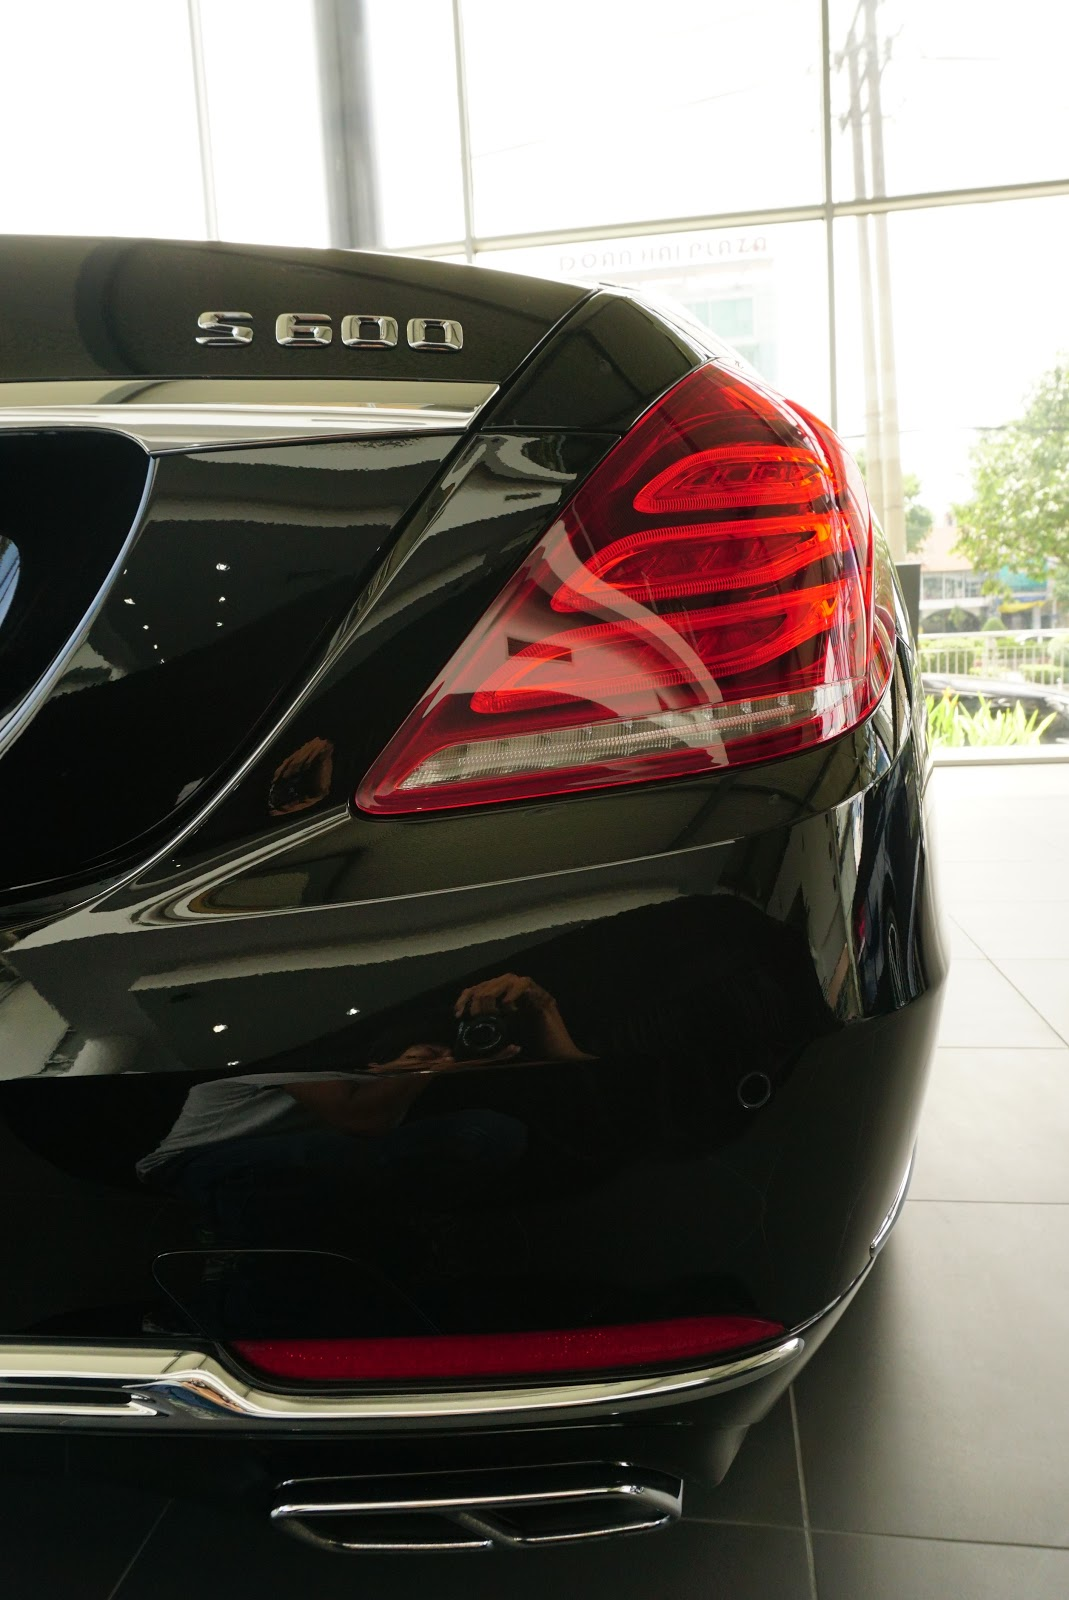 Ngoại Thất Xe Mercedes Benz S600 MAYBACH Màu Đen a06